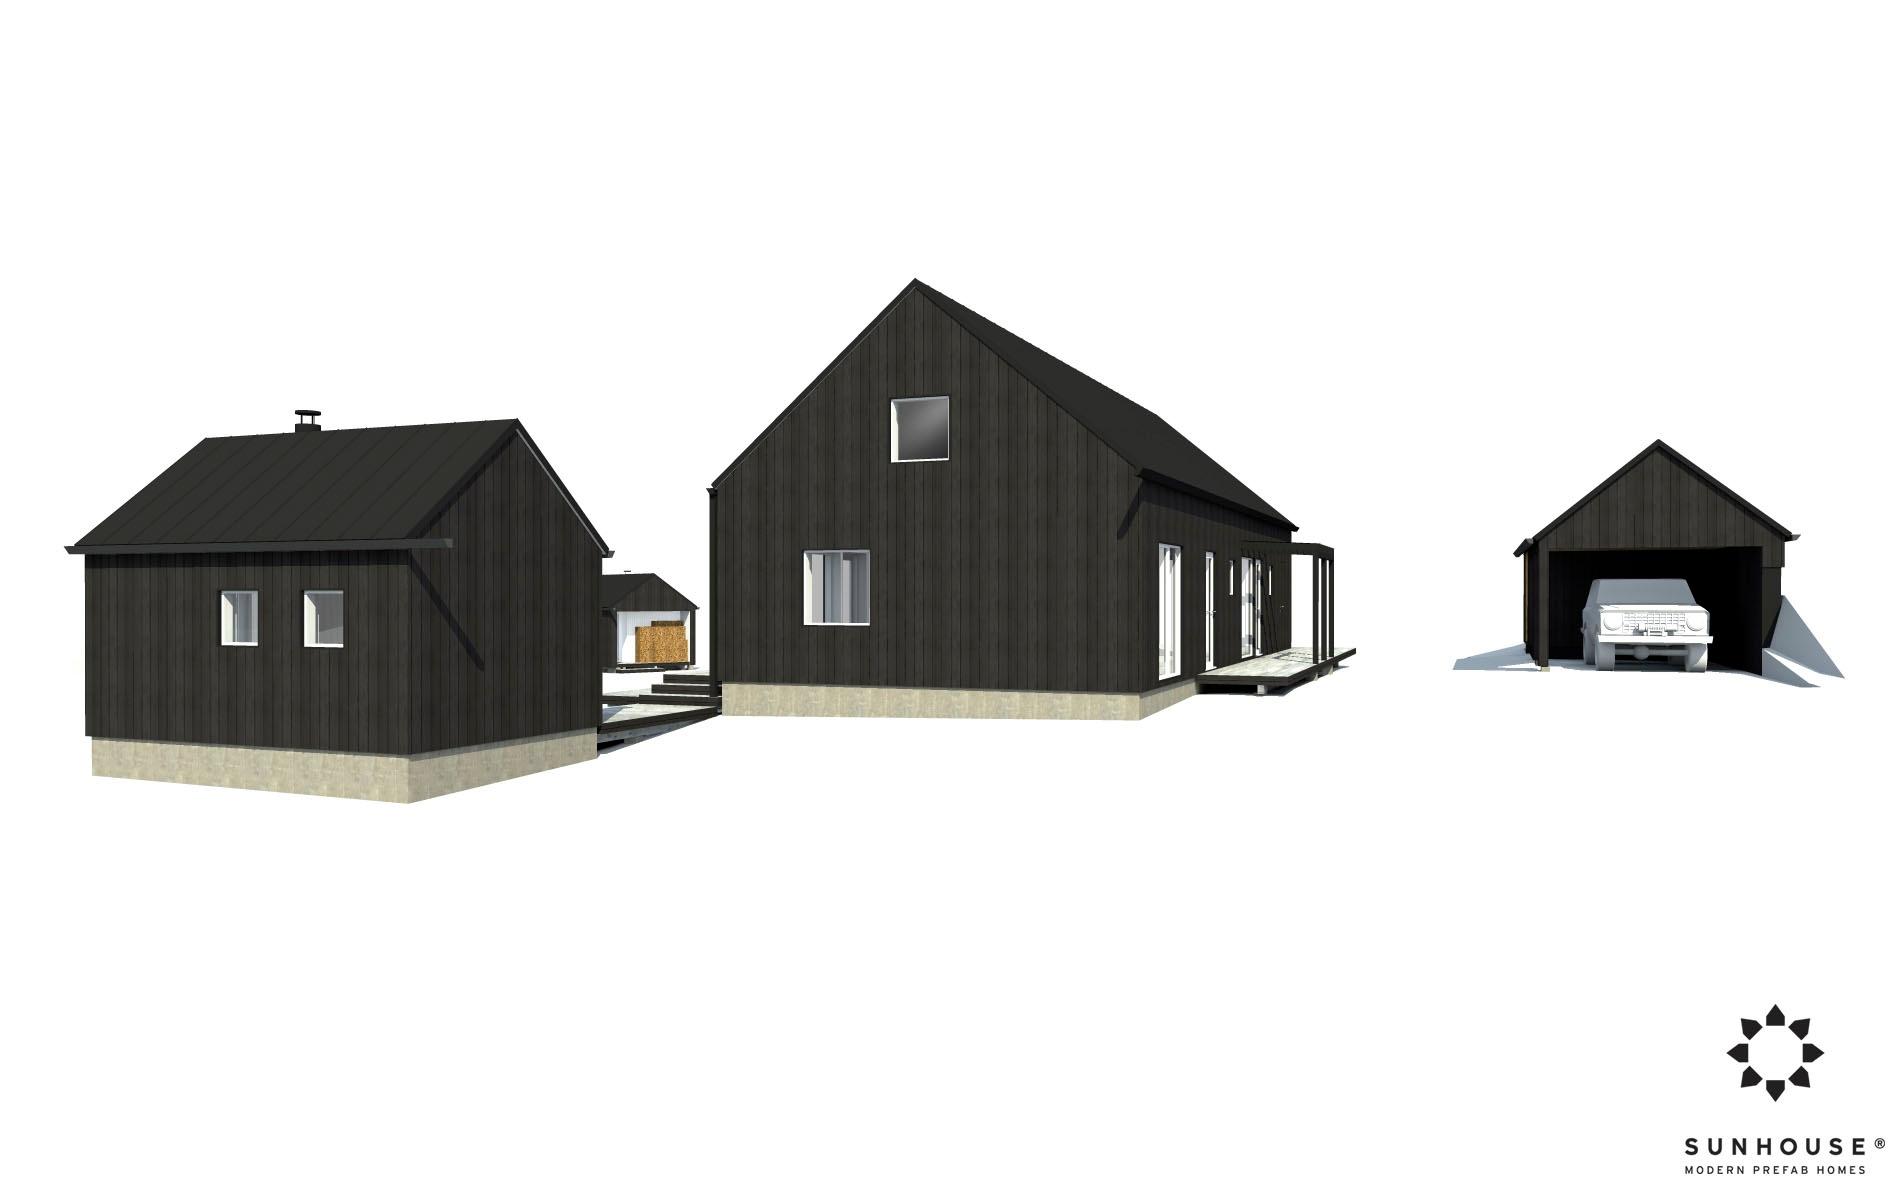 Sunhouse S1631 Moderni Omakotitalo